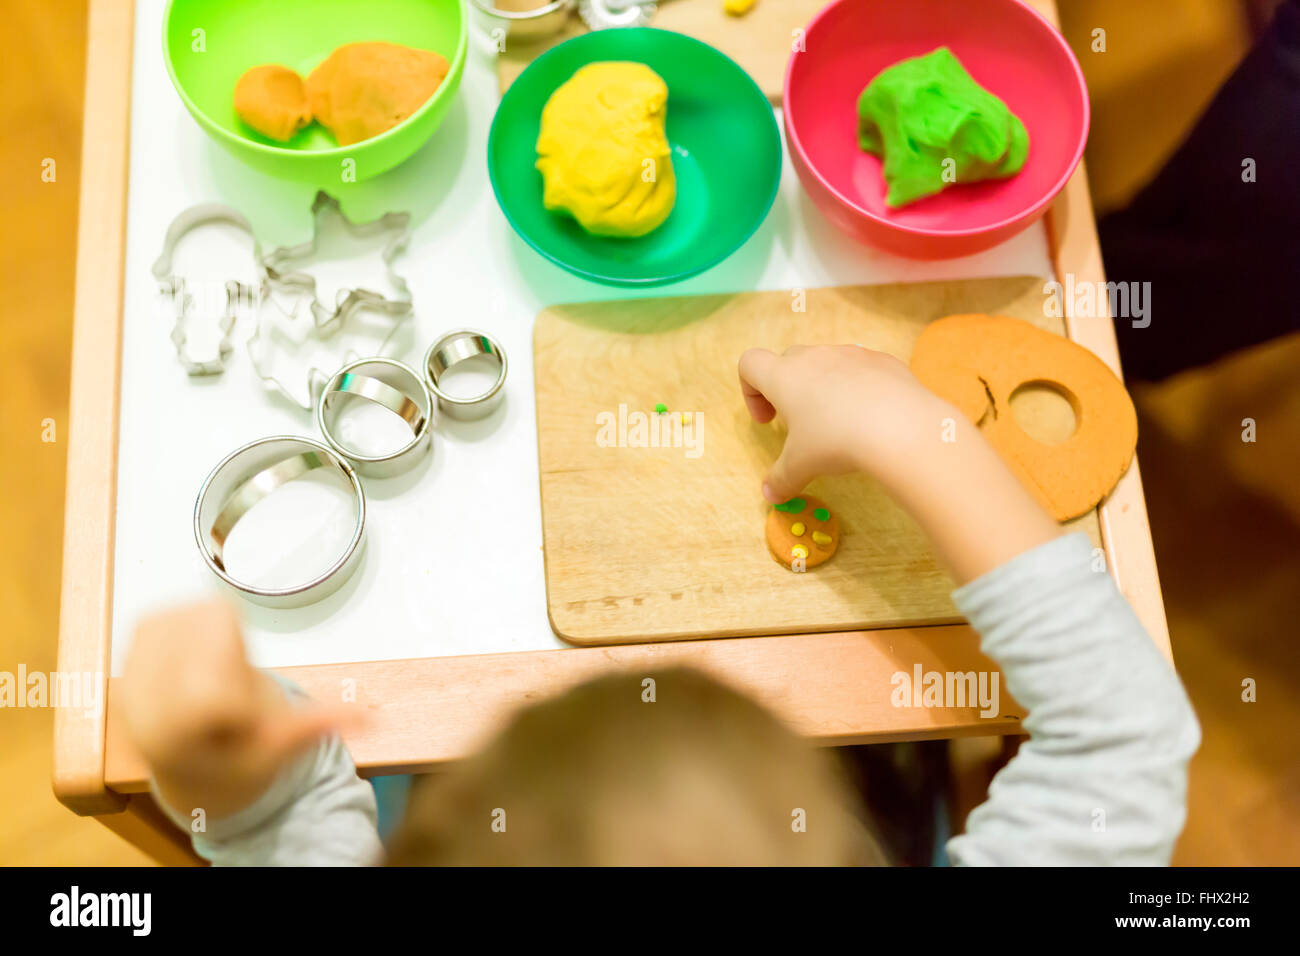 Creative kid playing with playdough - Stock Image